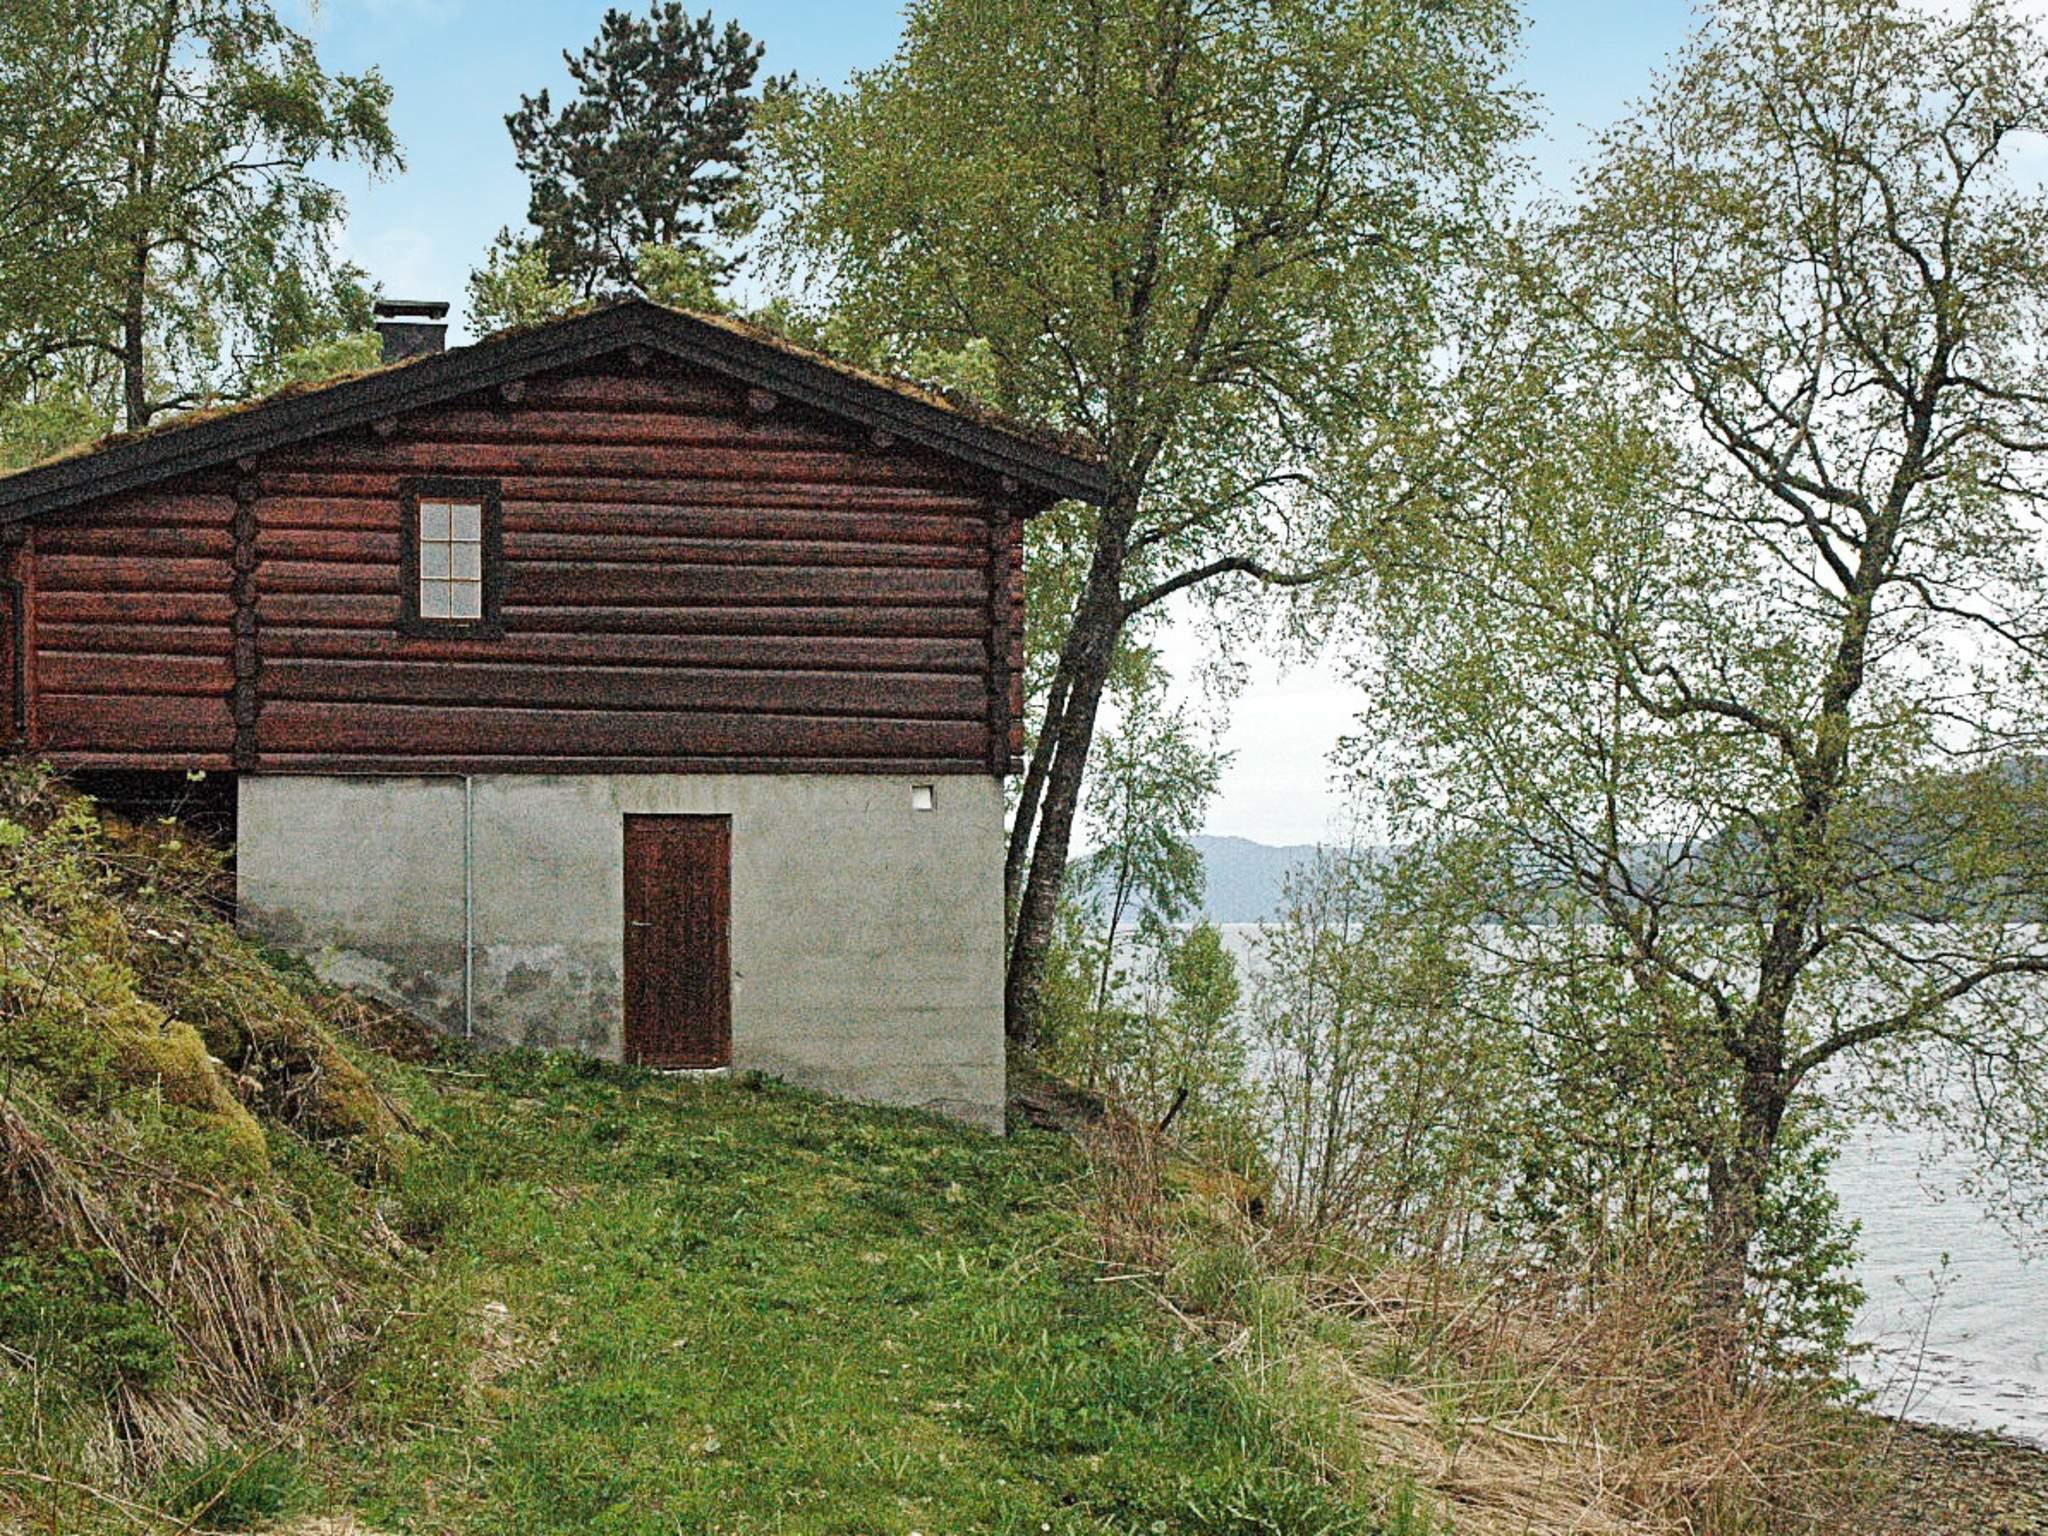 Ferienhaus Sjøasæter (1007184), Surna, More - Romsdal, Westnorwegen, Norwegen, Bild 11